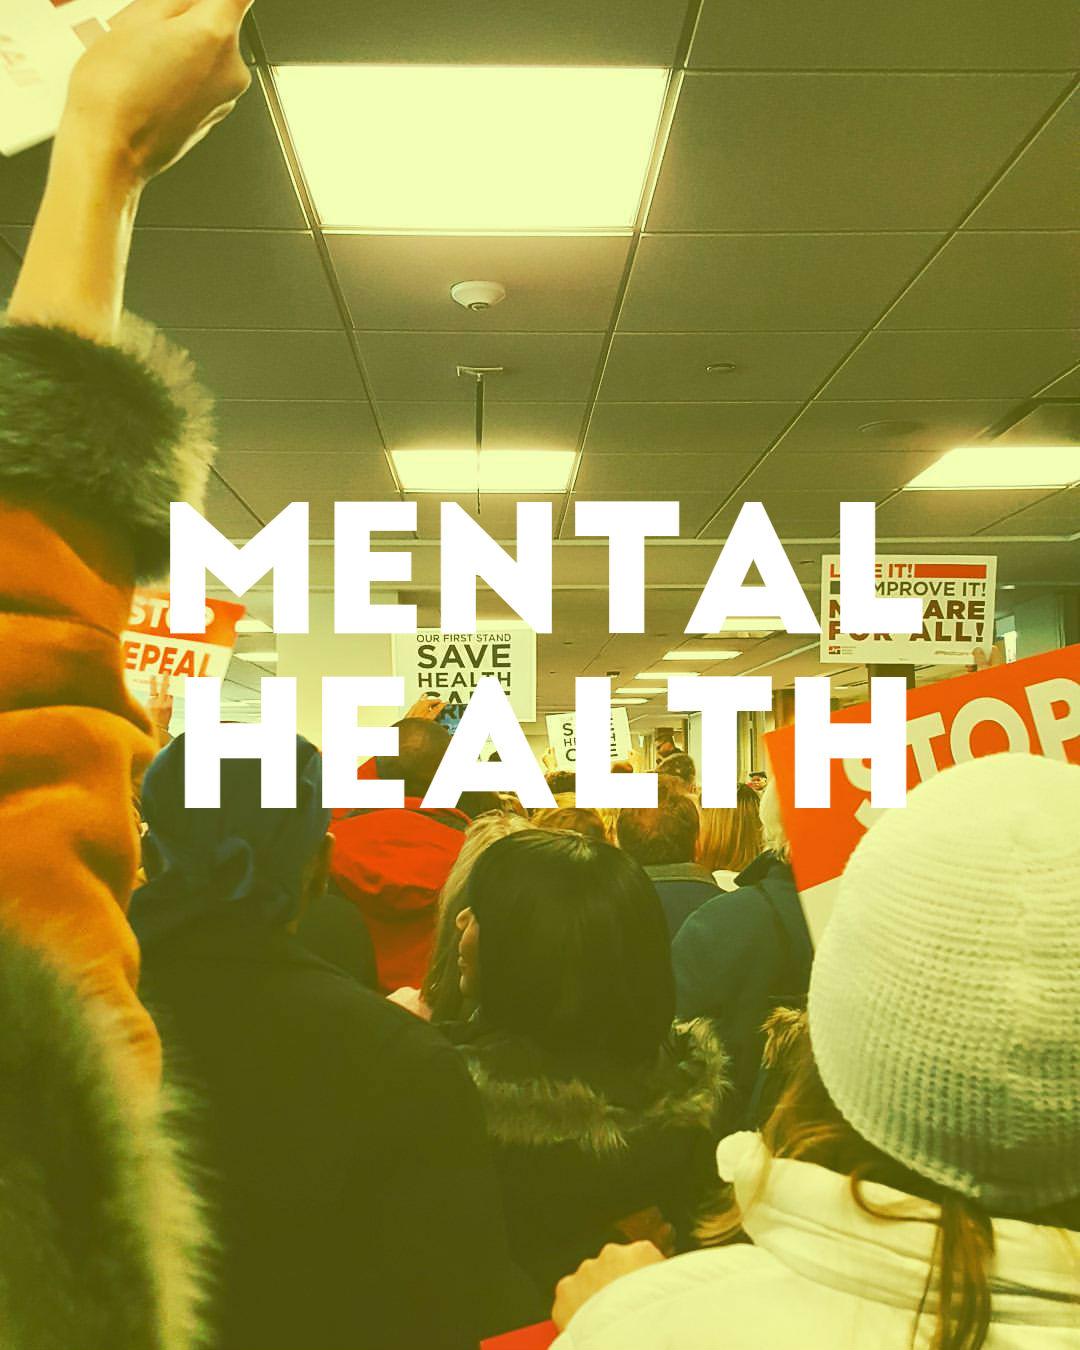 Vision_Mental_Health.jpg